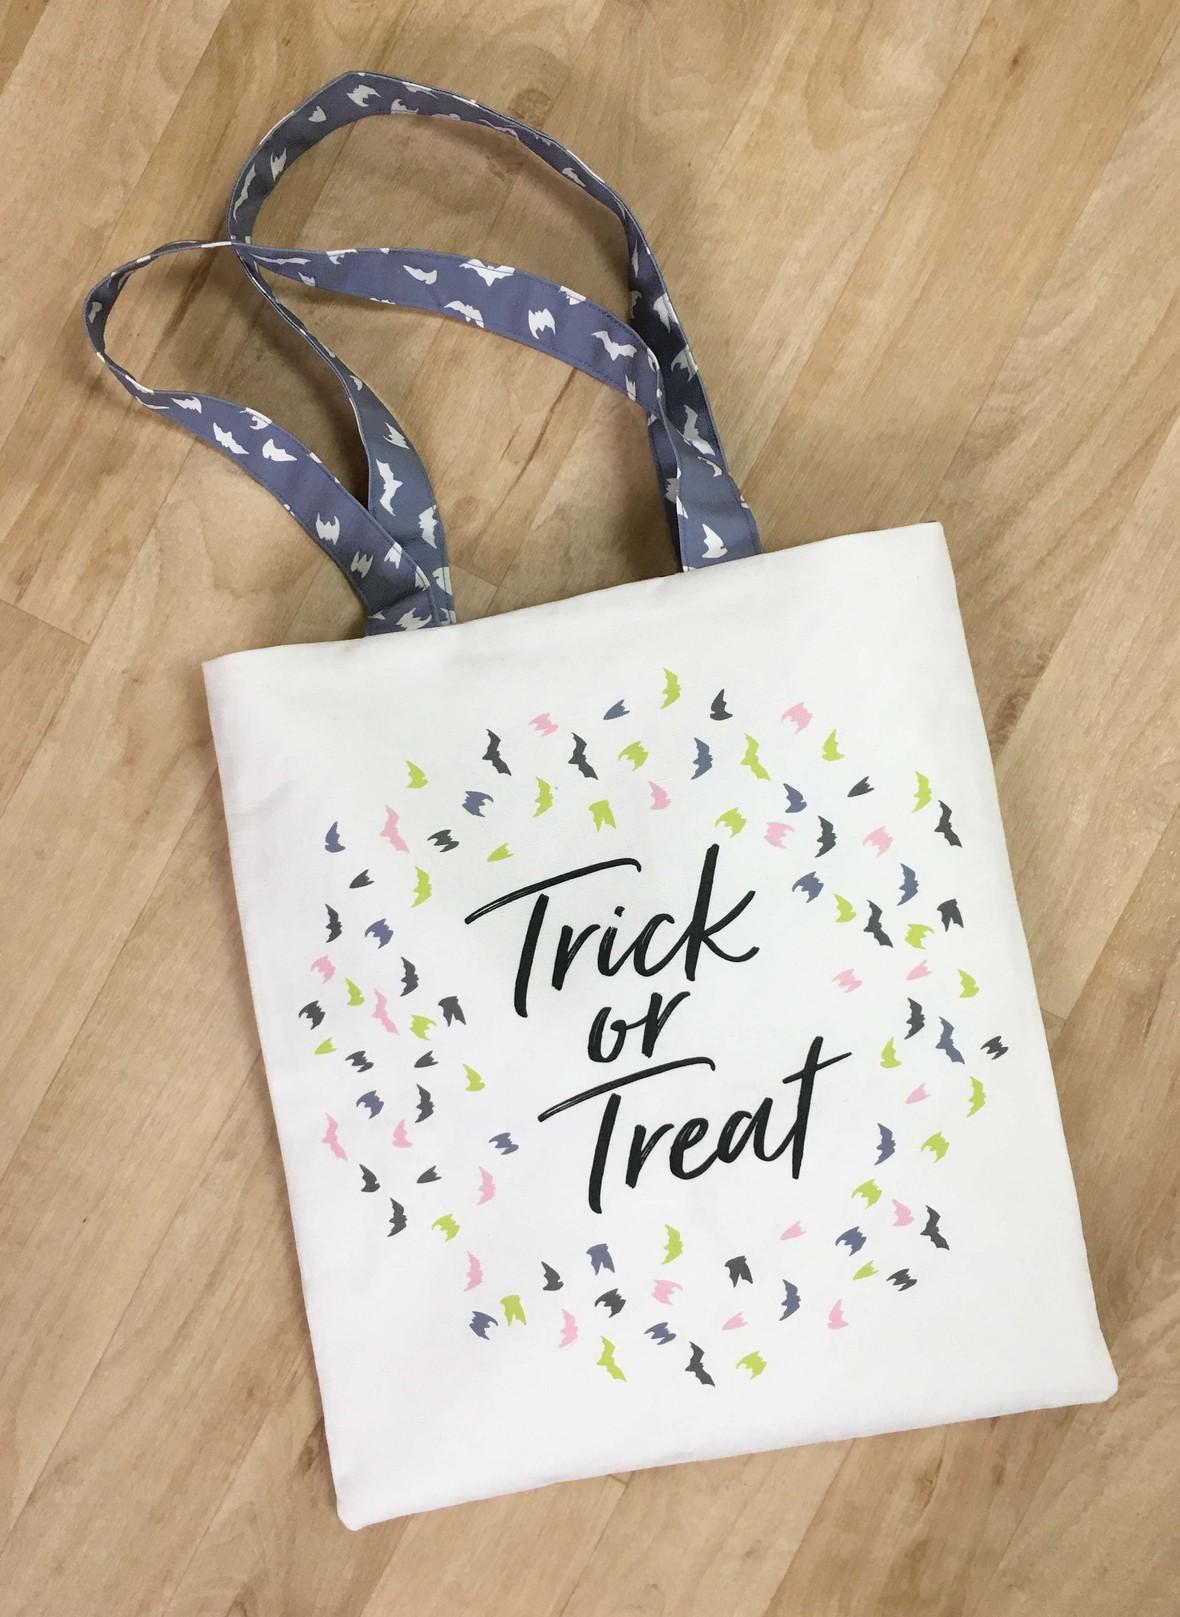 Haunted Fabric Trick or Treat Bag